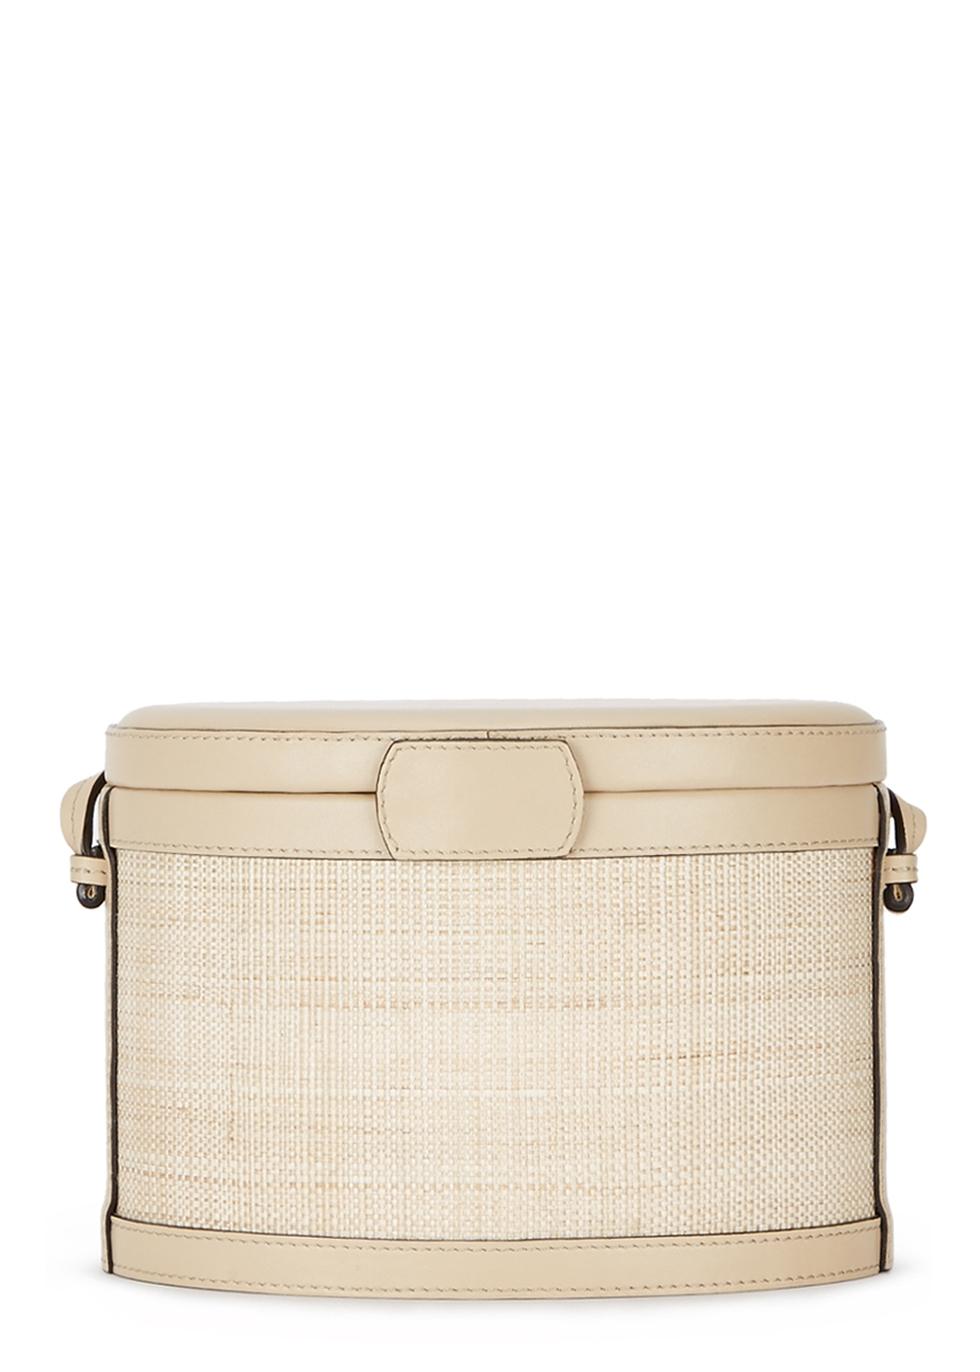 Ivory leather bucket bag - Hunting Season